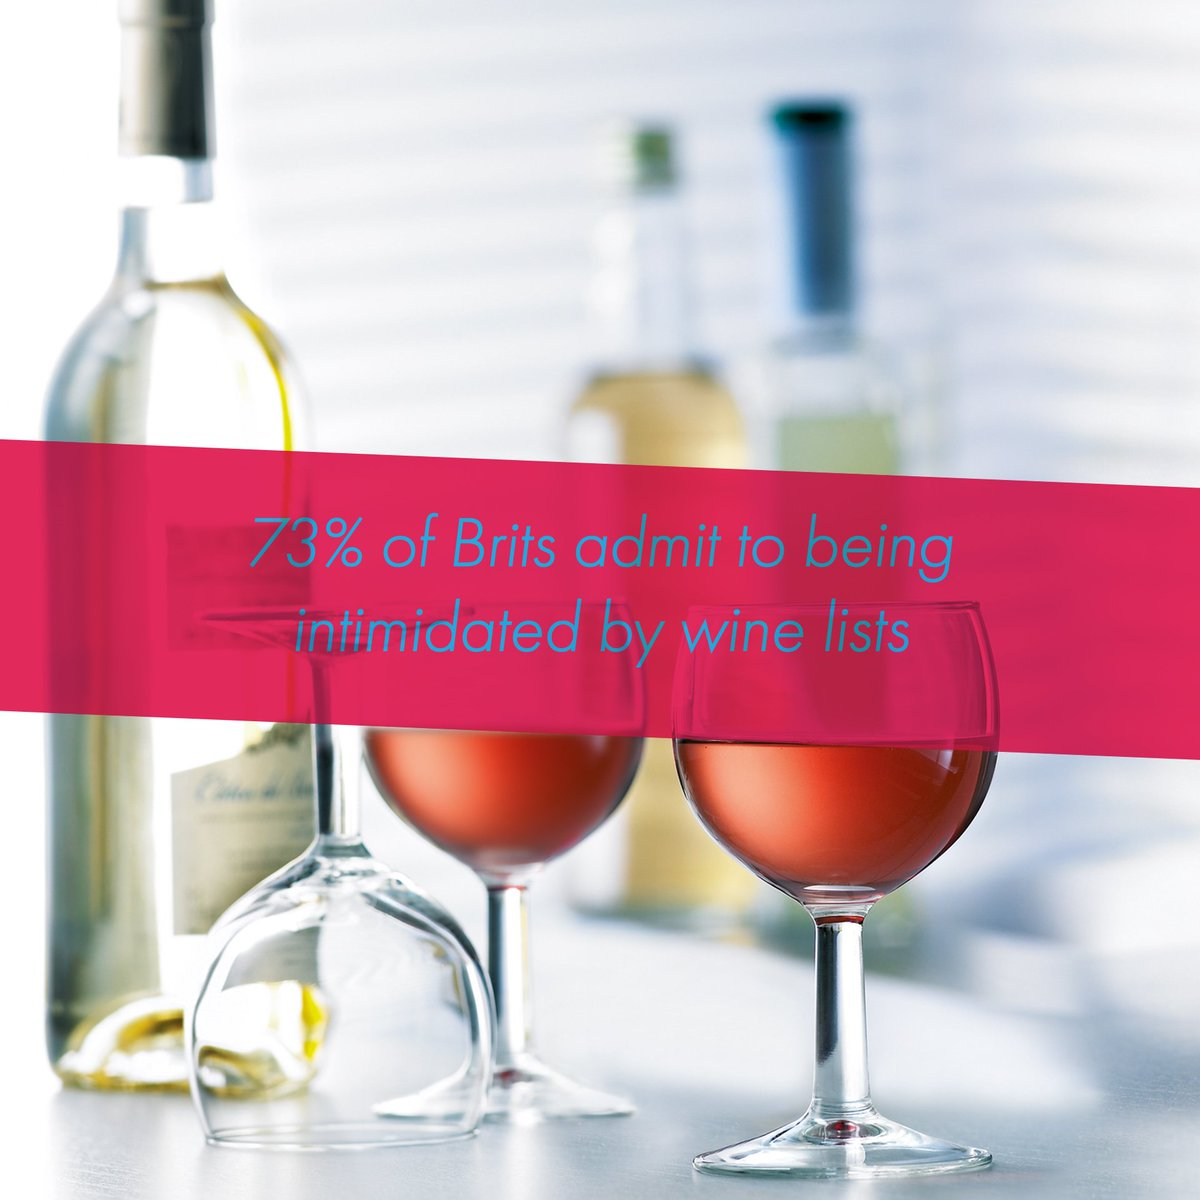 Arc Tableware UK (@arctableware) #WednesdayWineWisdom Are you afraid of wine lists? #Wine #Winesday #WednesdayWisdom #Facts #Factual #Drink #Stemware # ... & Images and video about Arc Tableware UK (@arctableware) user on ...